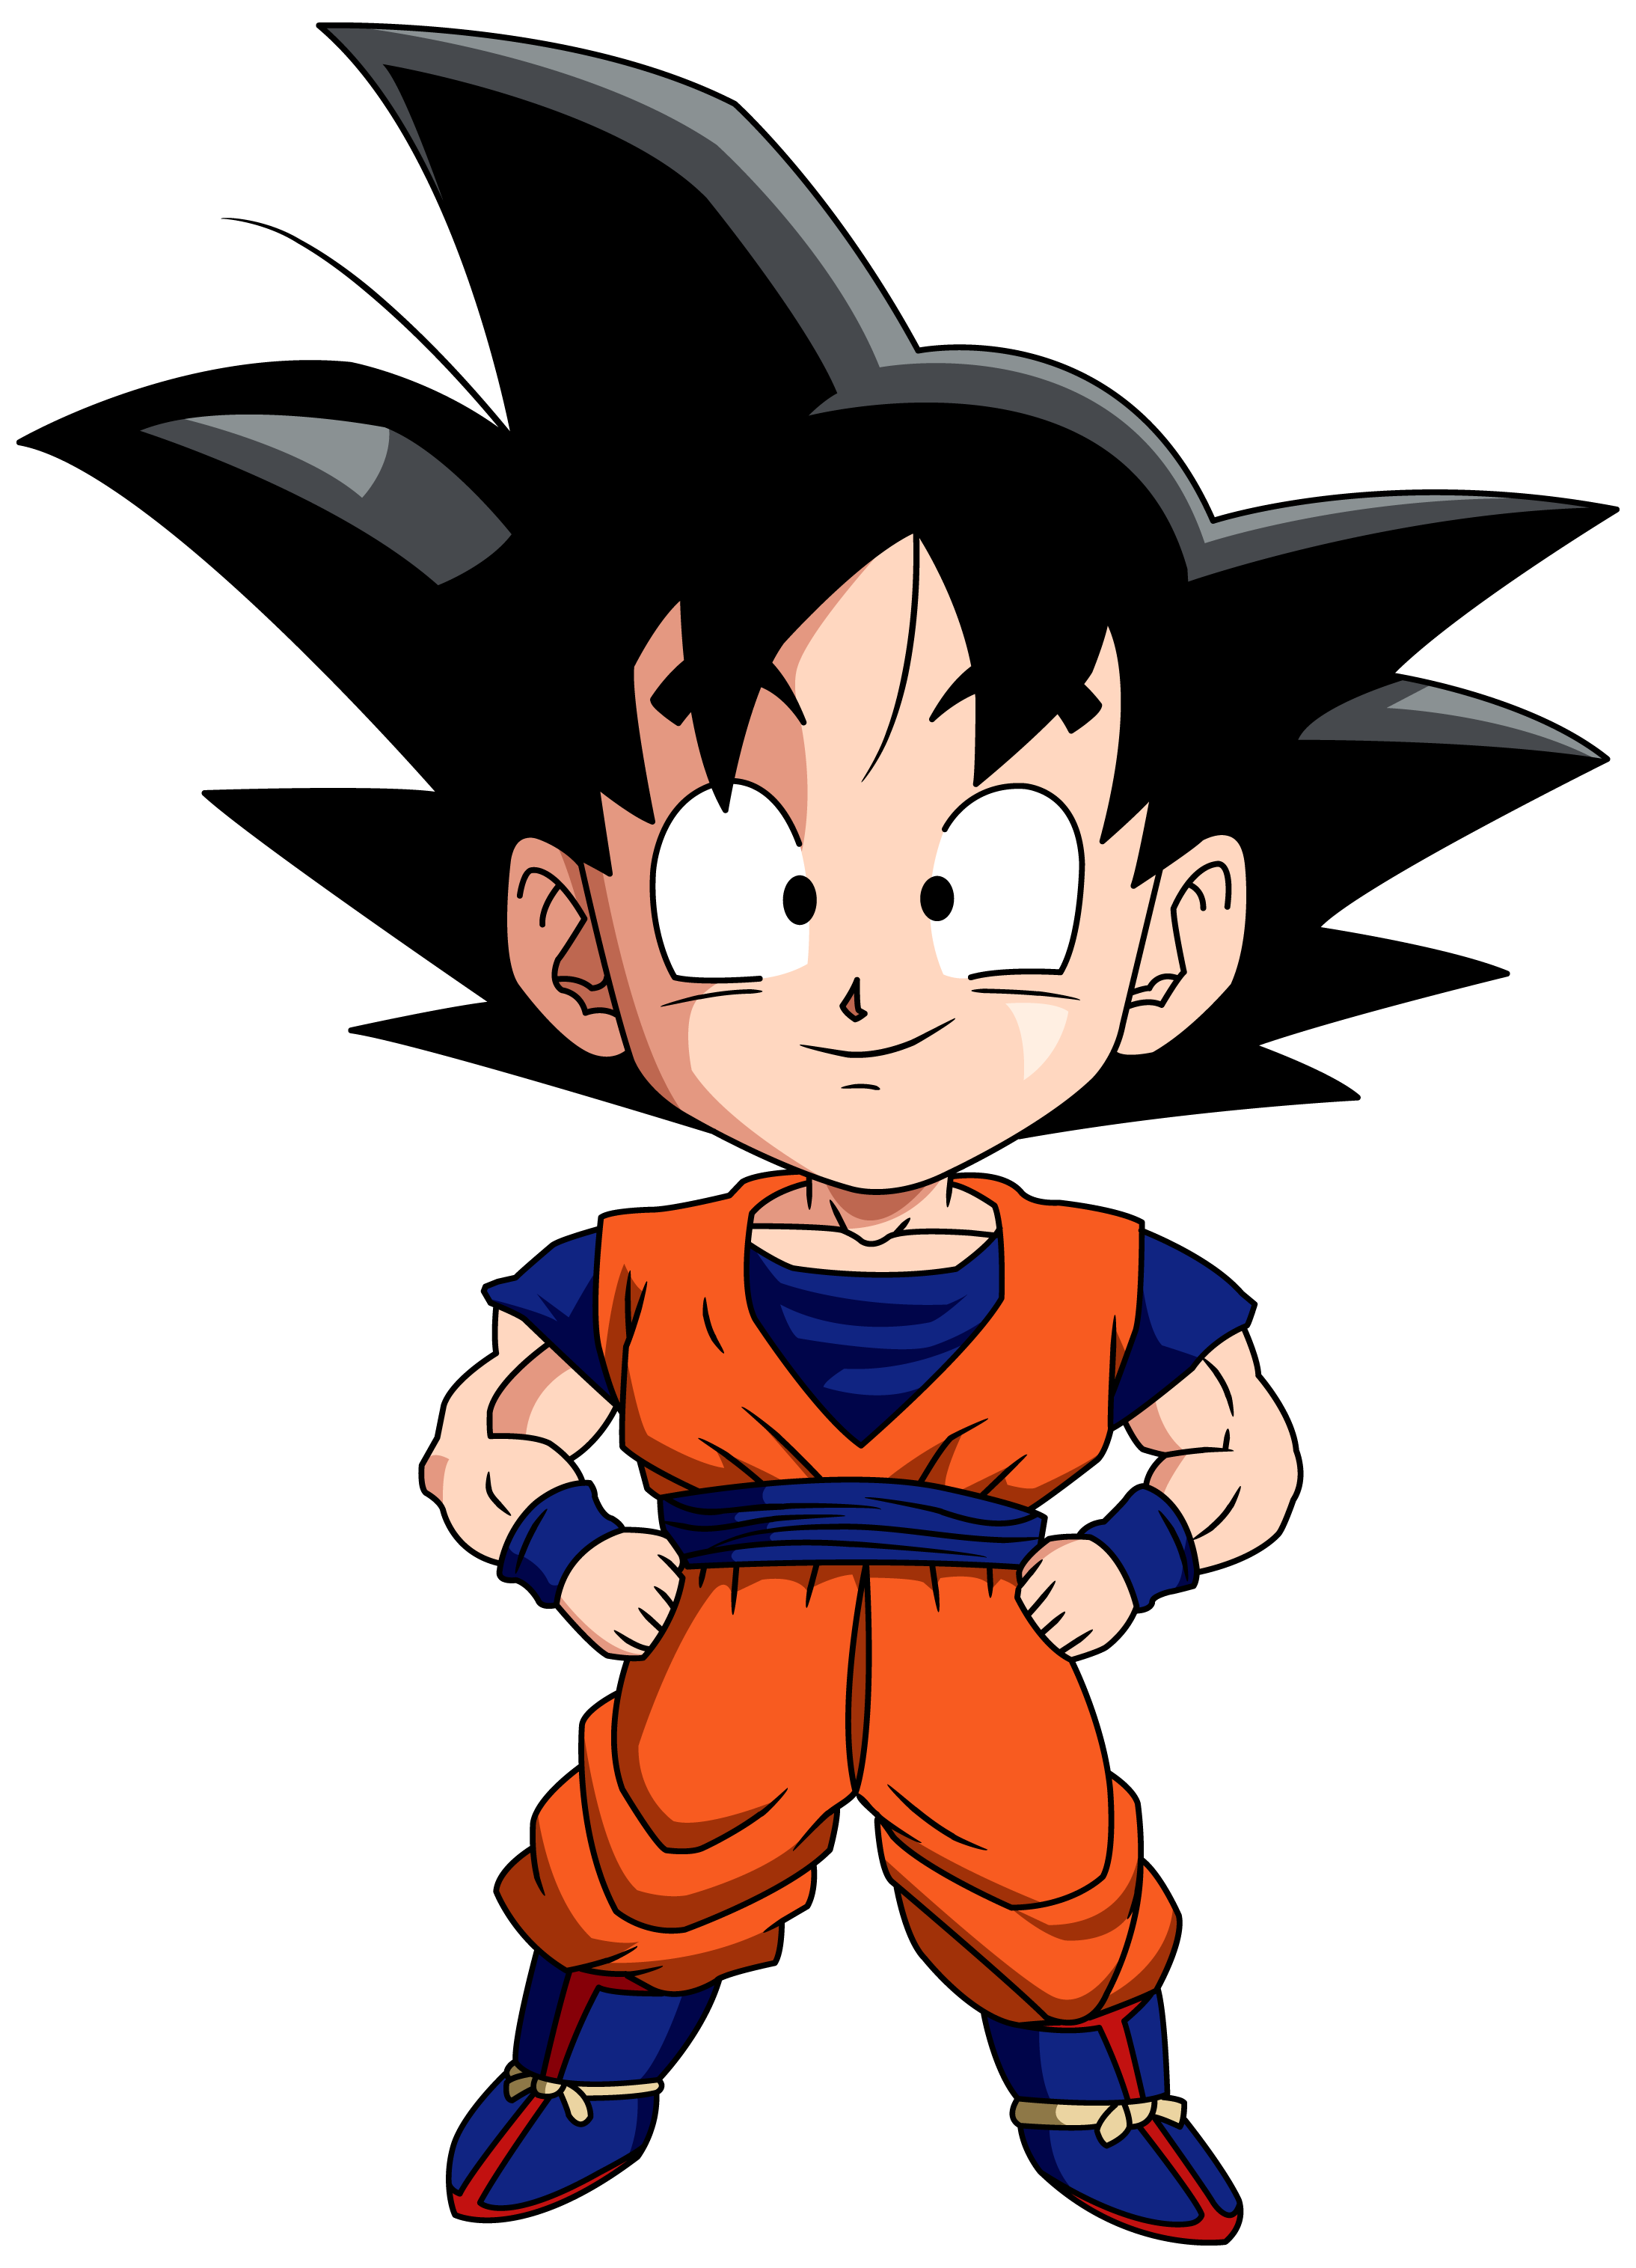 Goku chibi by maffo. Youtube clipart dragon ball z